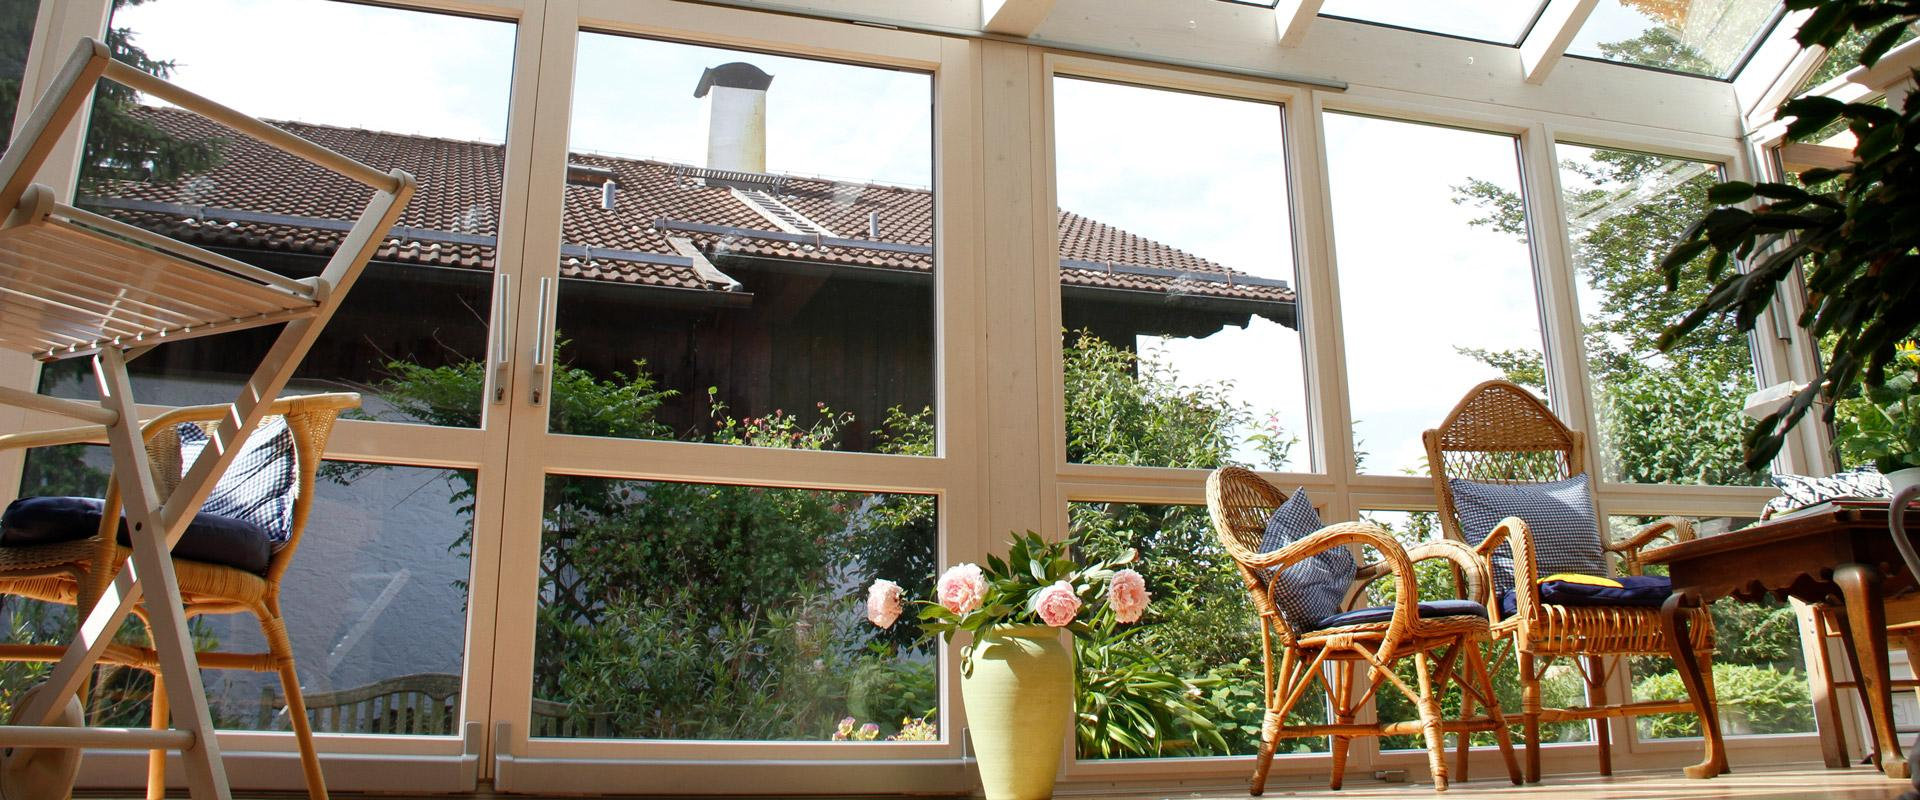 profi f r den wohn wintergarten virgil niedermayr in. Black Bedroom Furniture Sets. Home Design Ideas